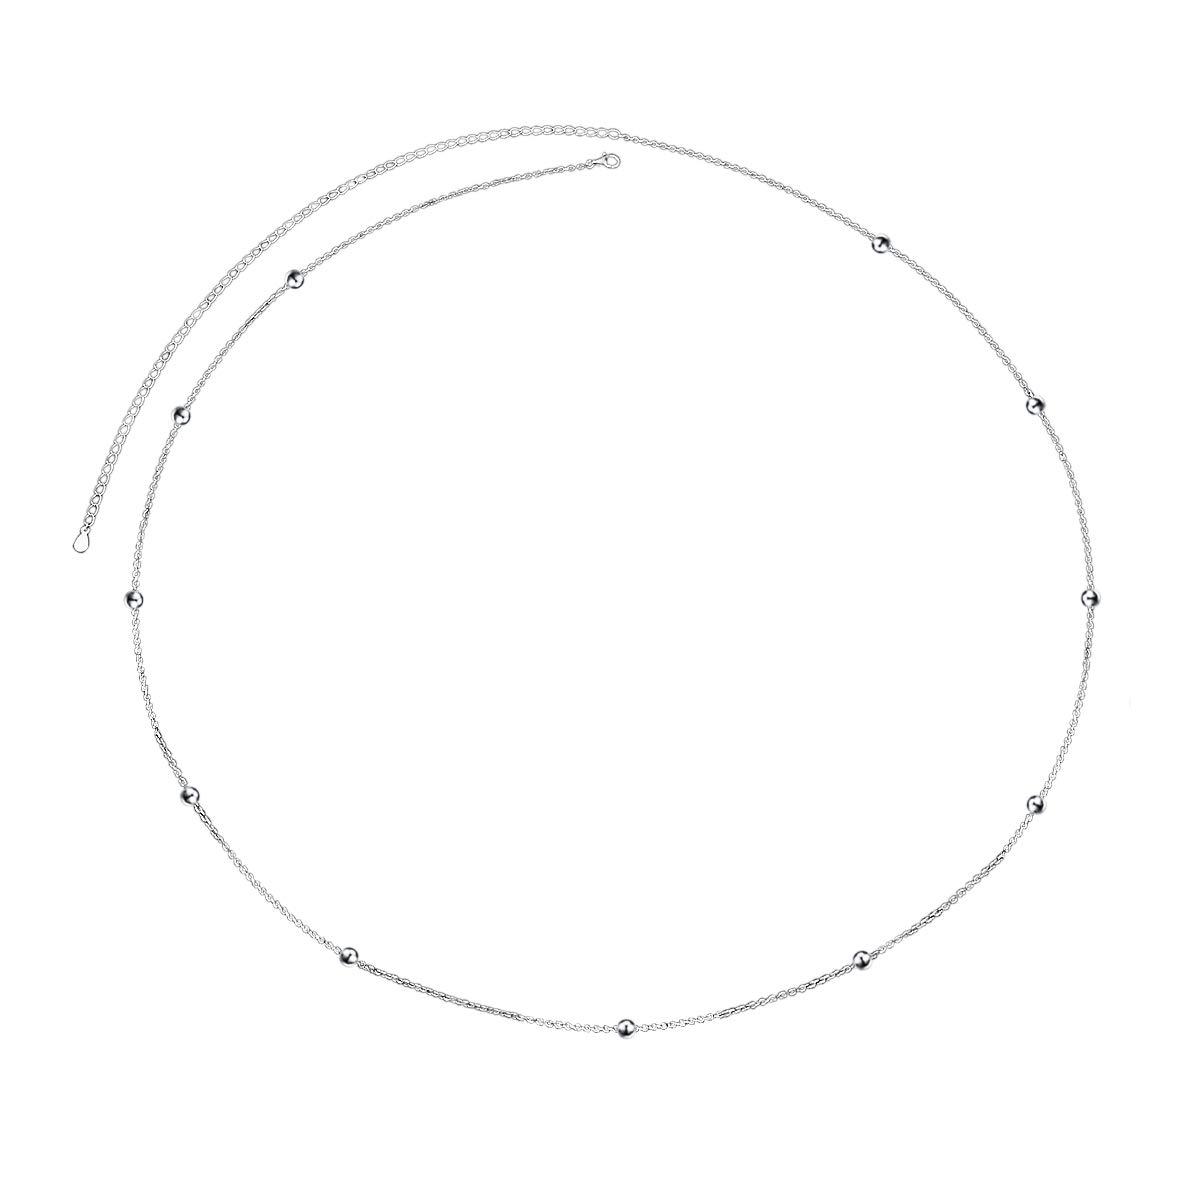 ALPHM S925 Sterling Silver Bead Waist Belt Belly Chain Adjustable Body Chain by ALPHM